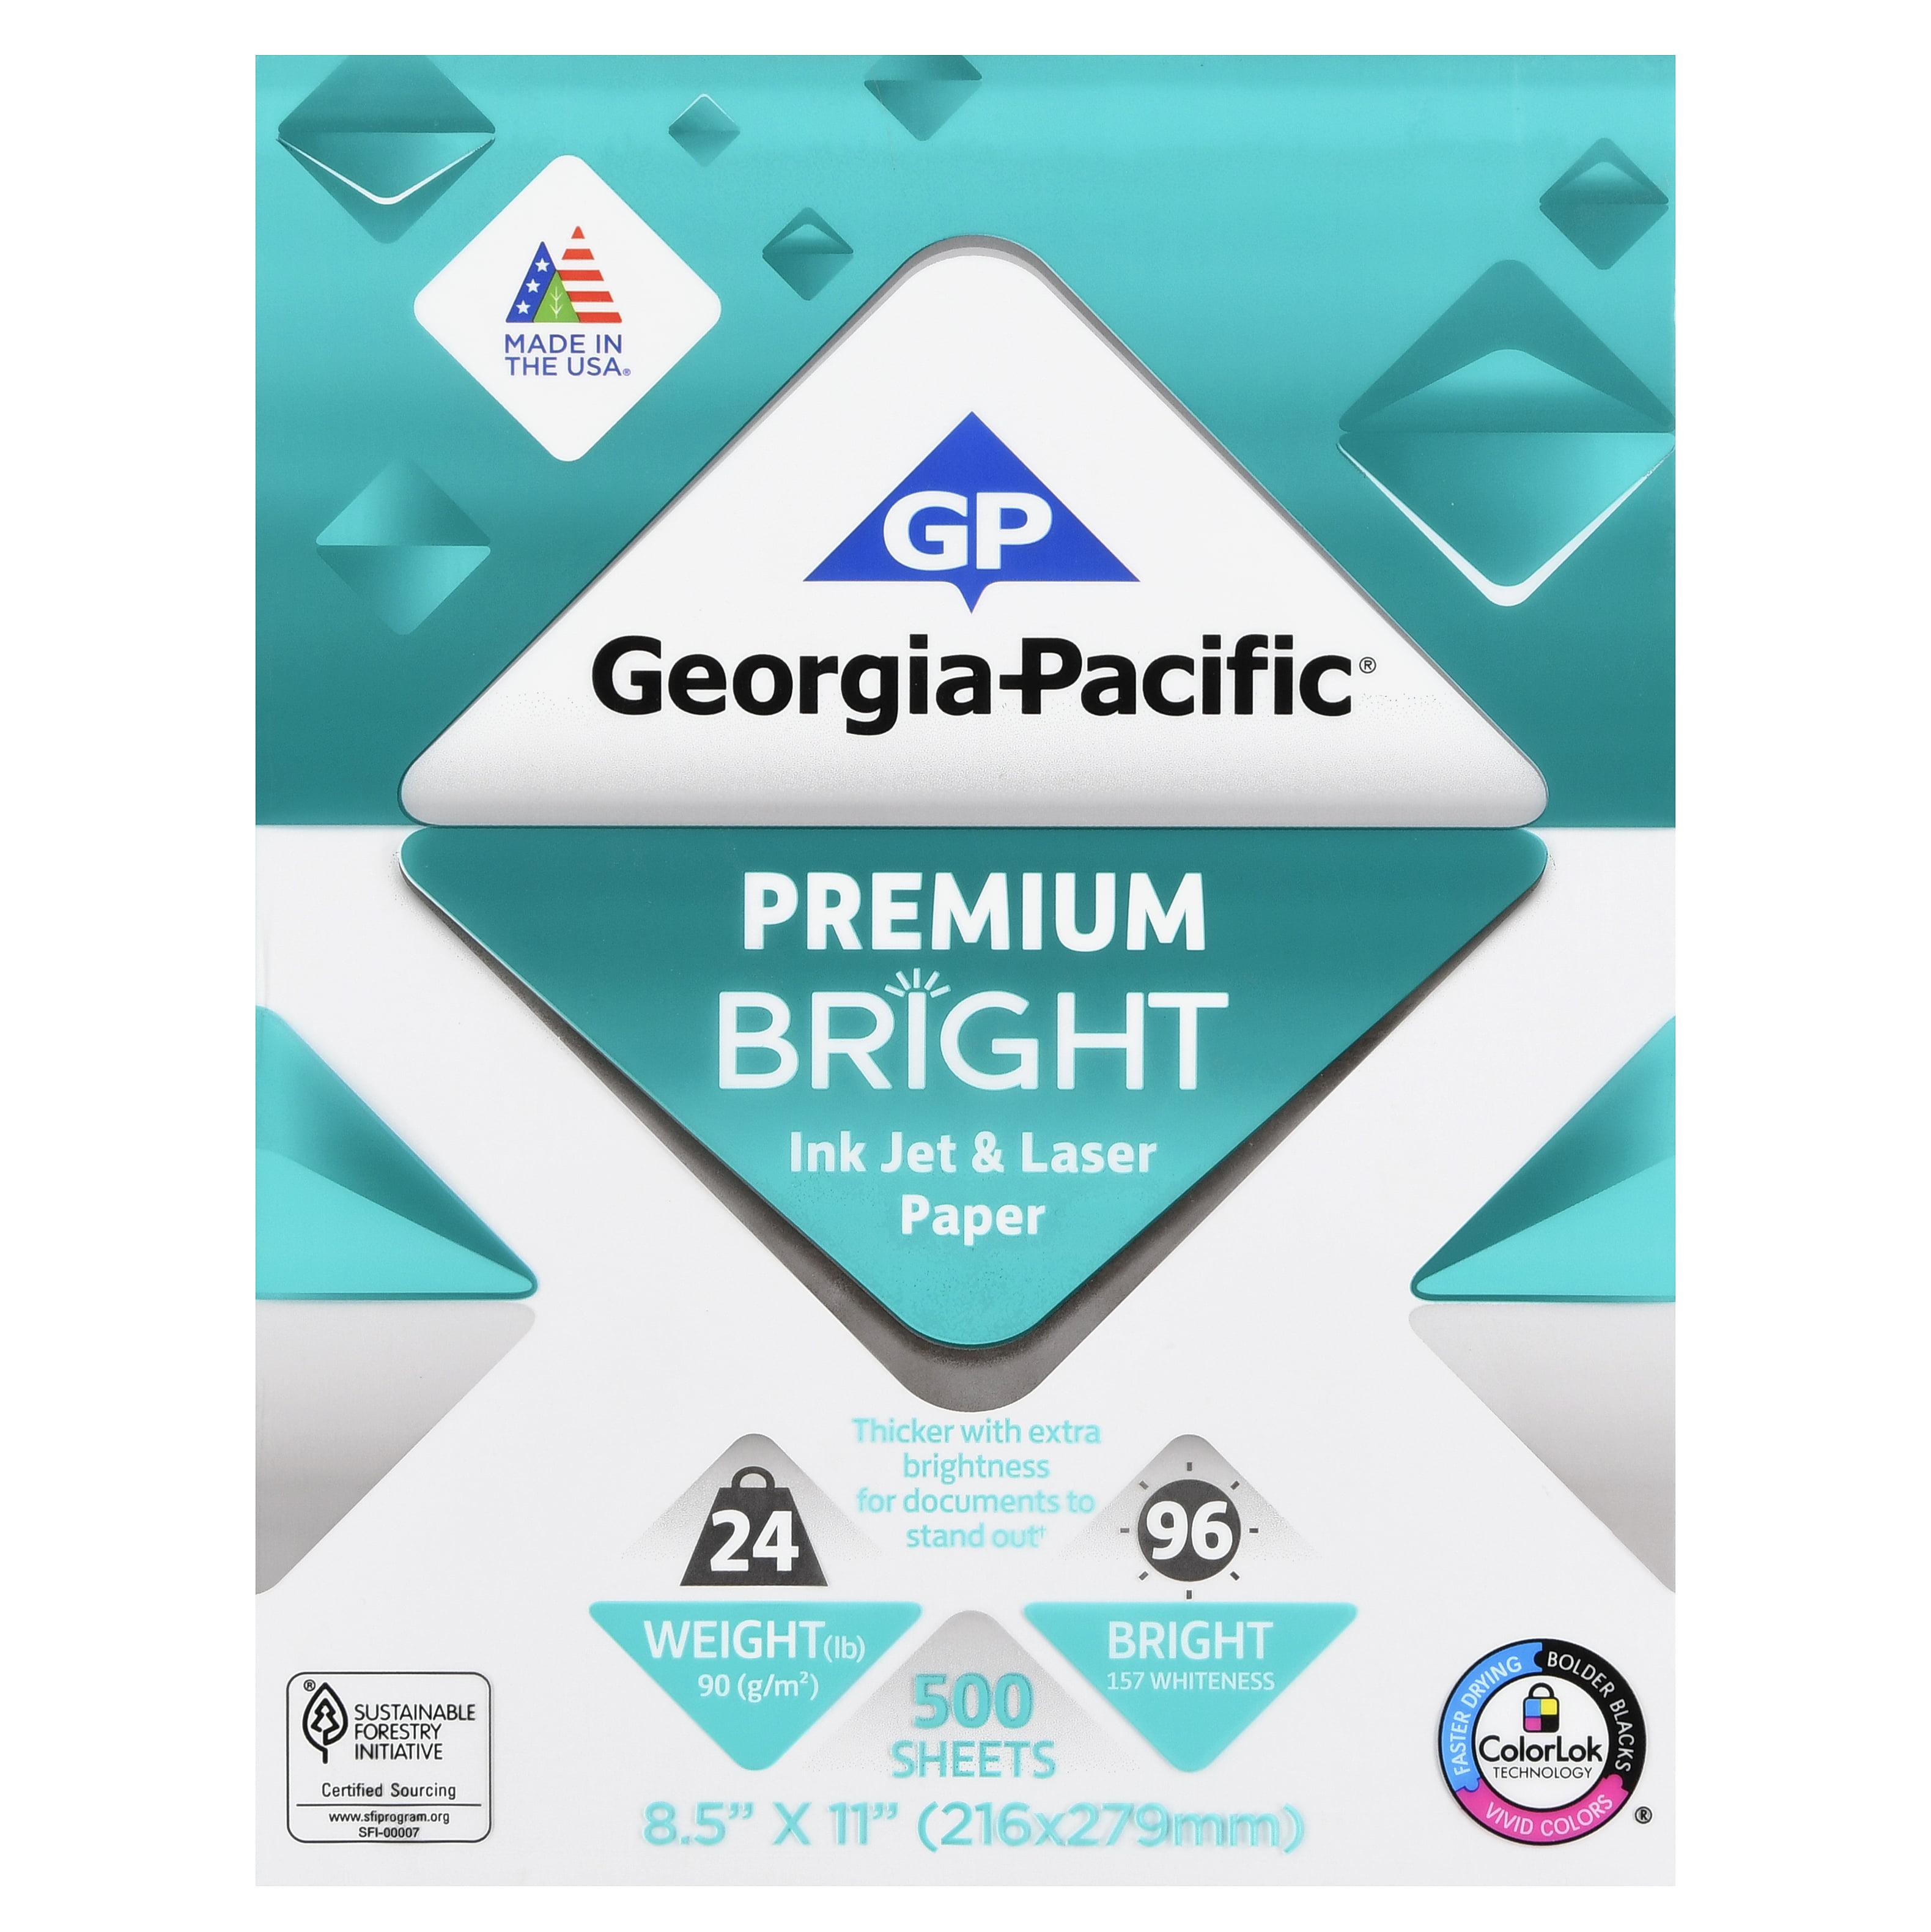 "Georgia-Pacific Premium Bright Inkjet and Laser Paper, 8.5"" x 11"", 24 lb, 96 Brightness, 500 Sheets"